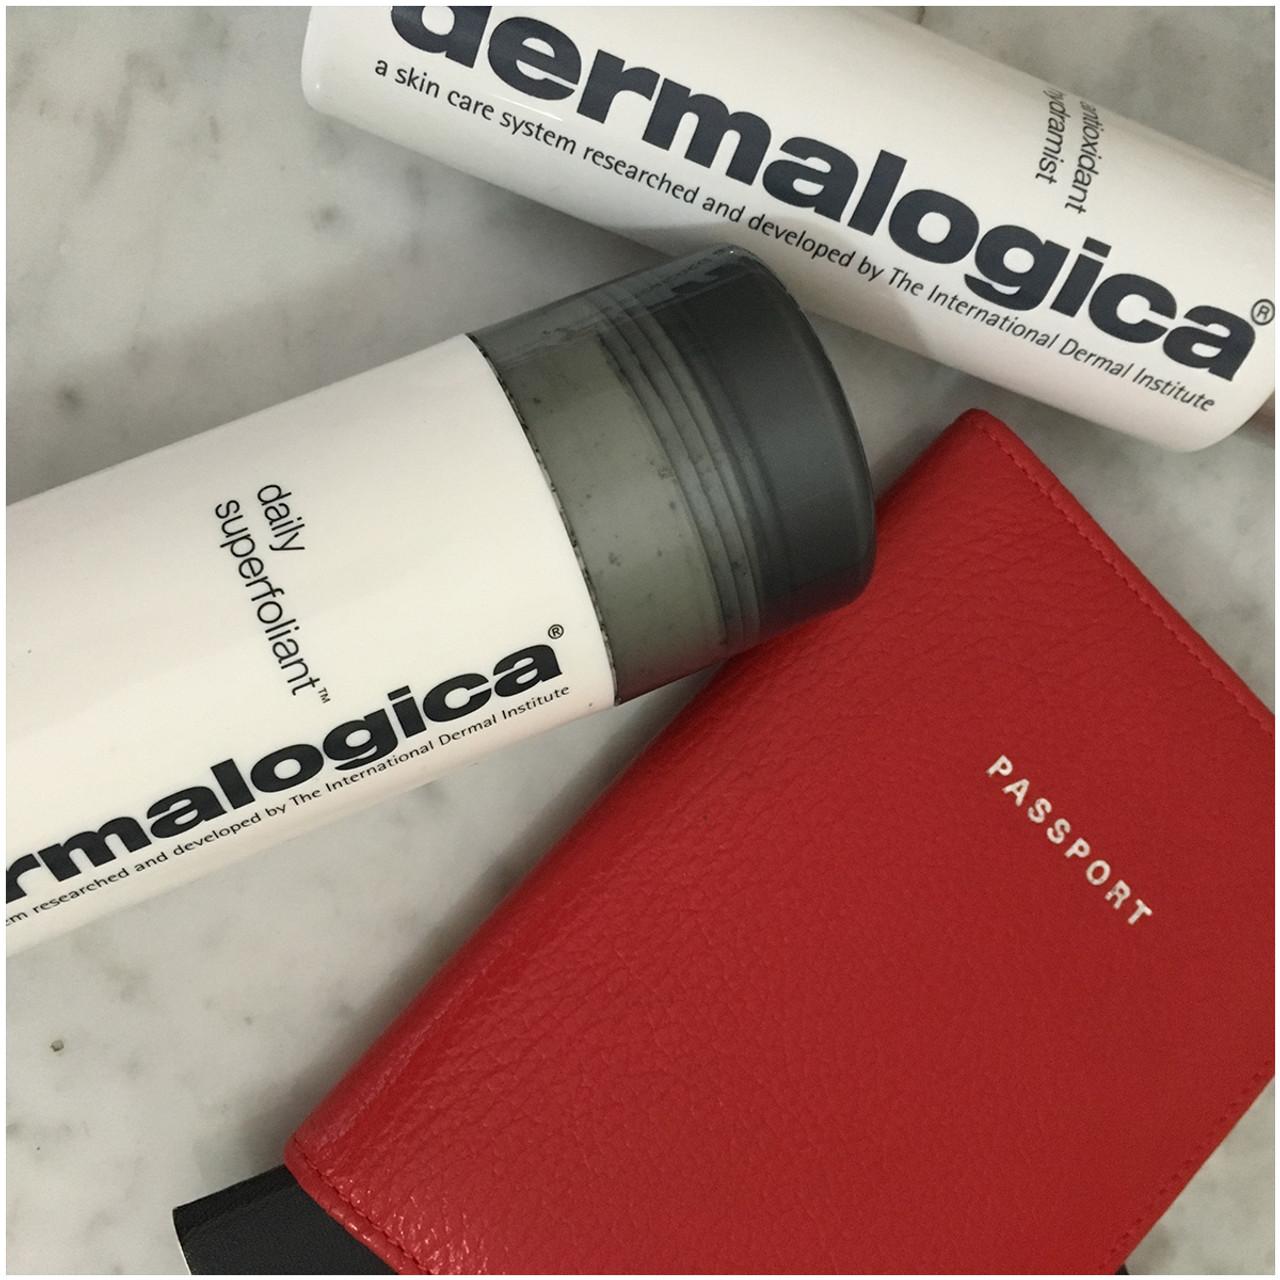 Getaway Skin Care... Your travel skin care essentials